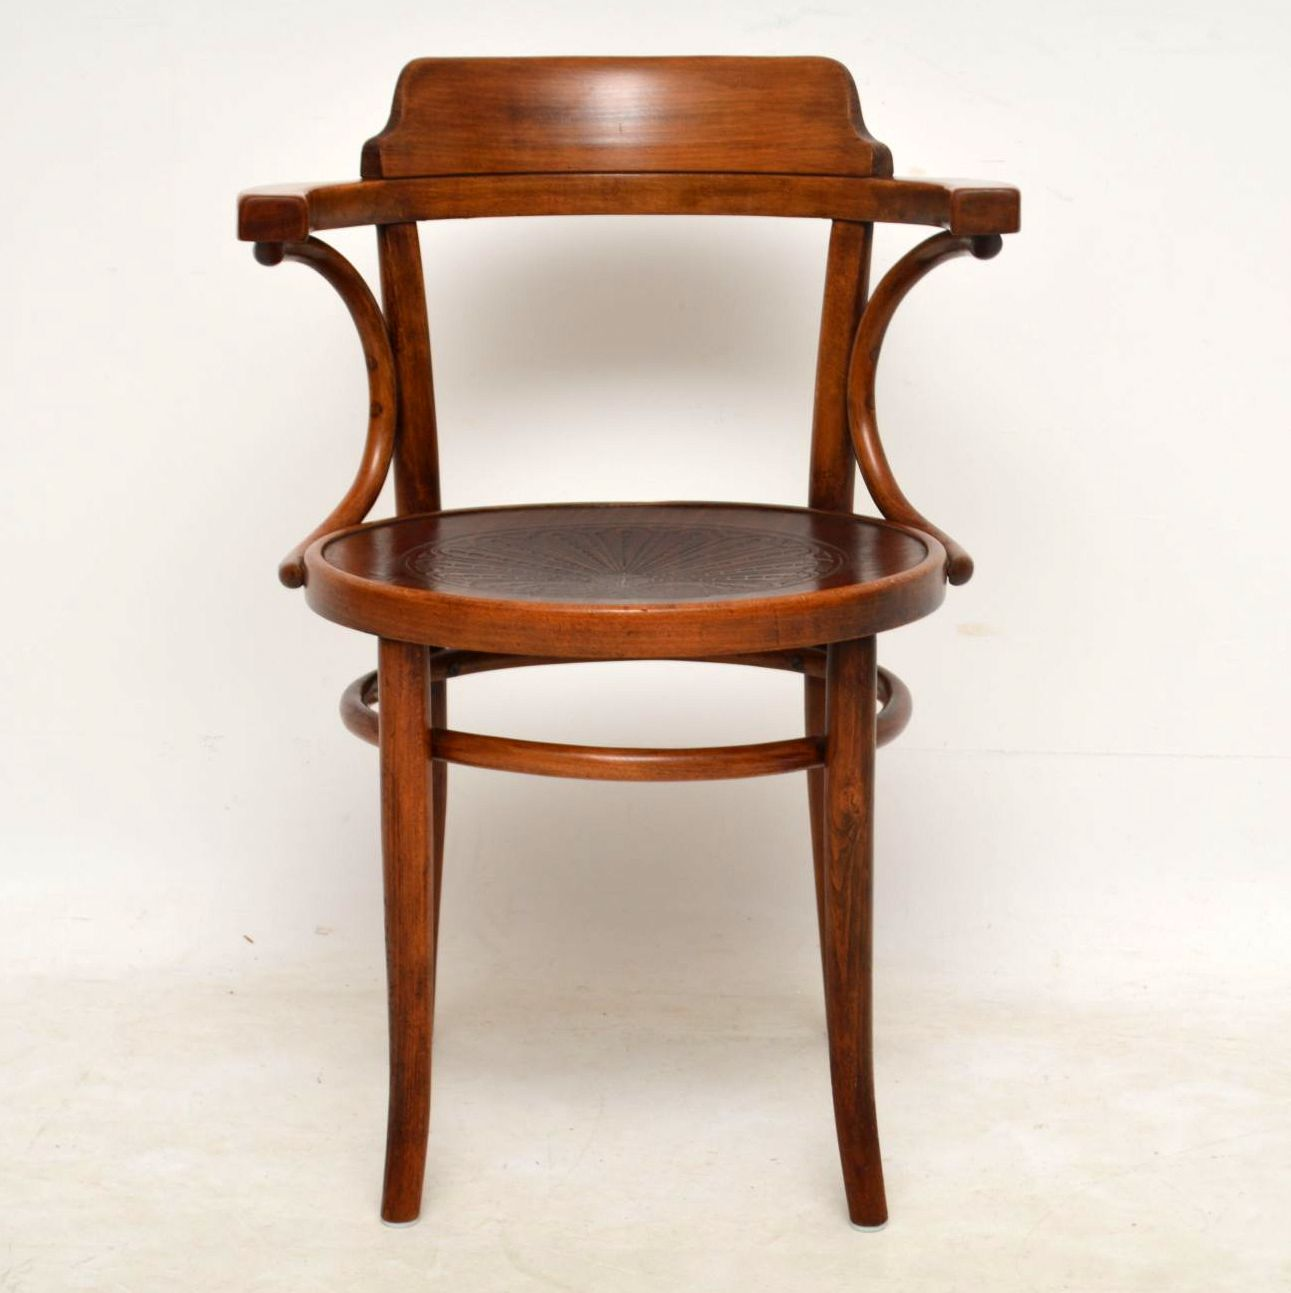 Pair of Antique Bentwood Thonet Armchairs - Marylebone ...